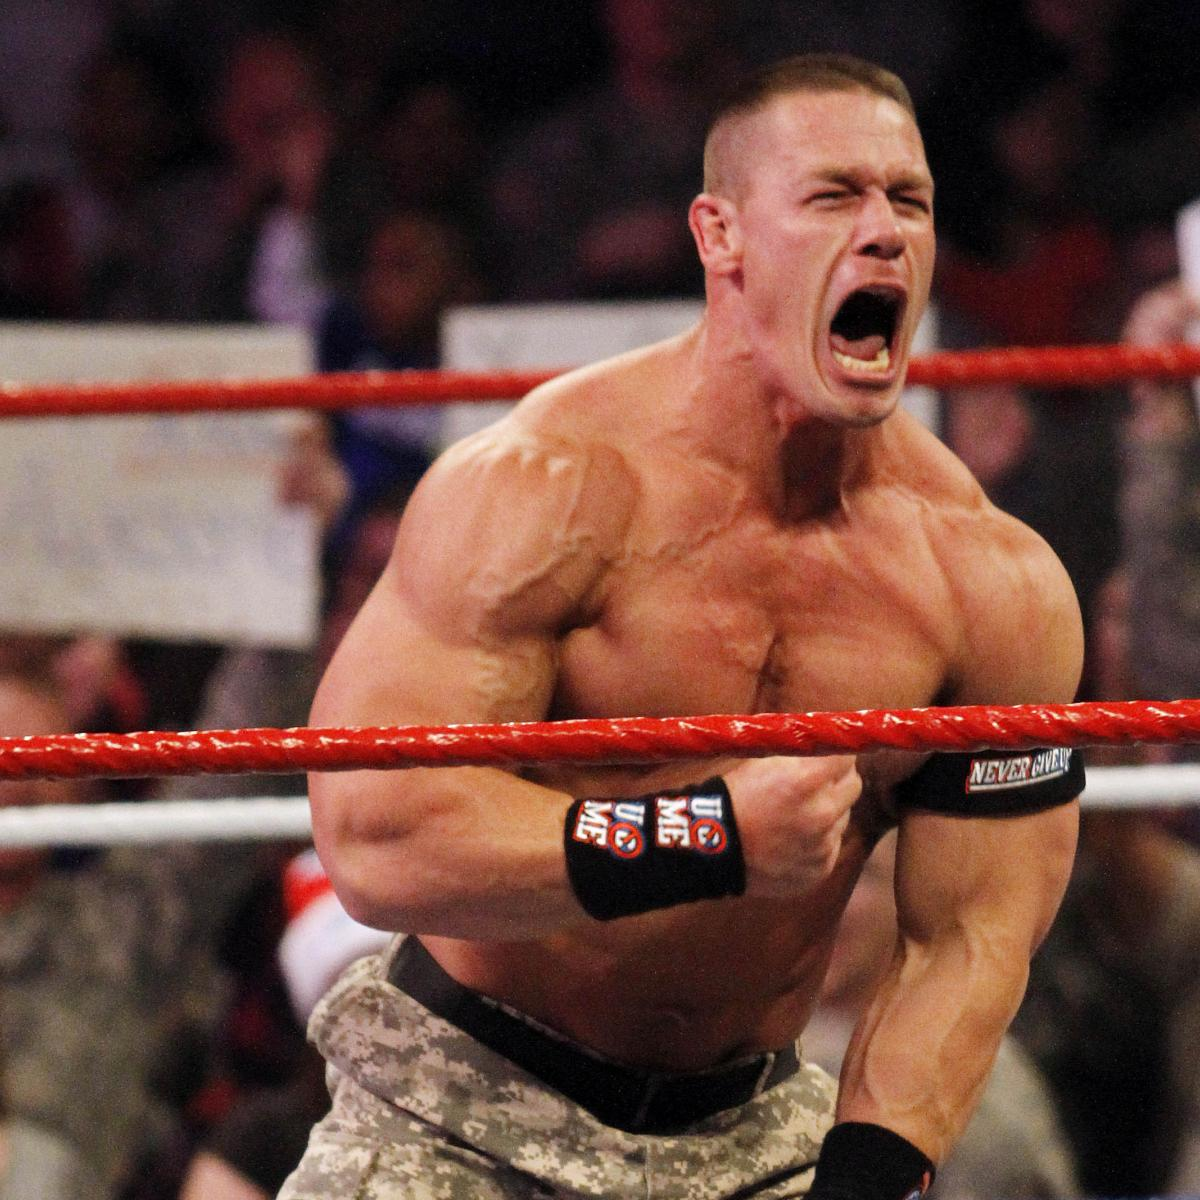 John Cena vs. Randy Orton: WWE Title Match Will Disappoint ...  John Cena vs. R...